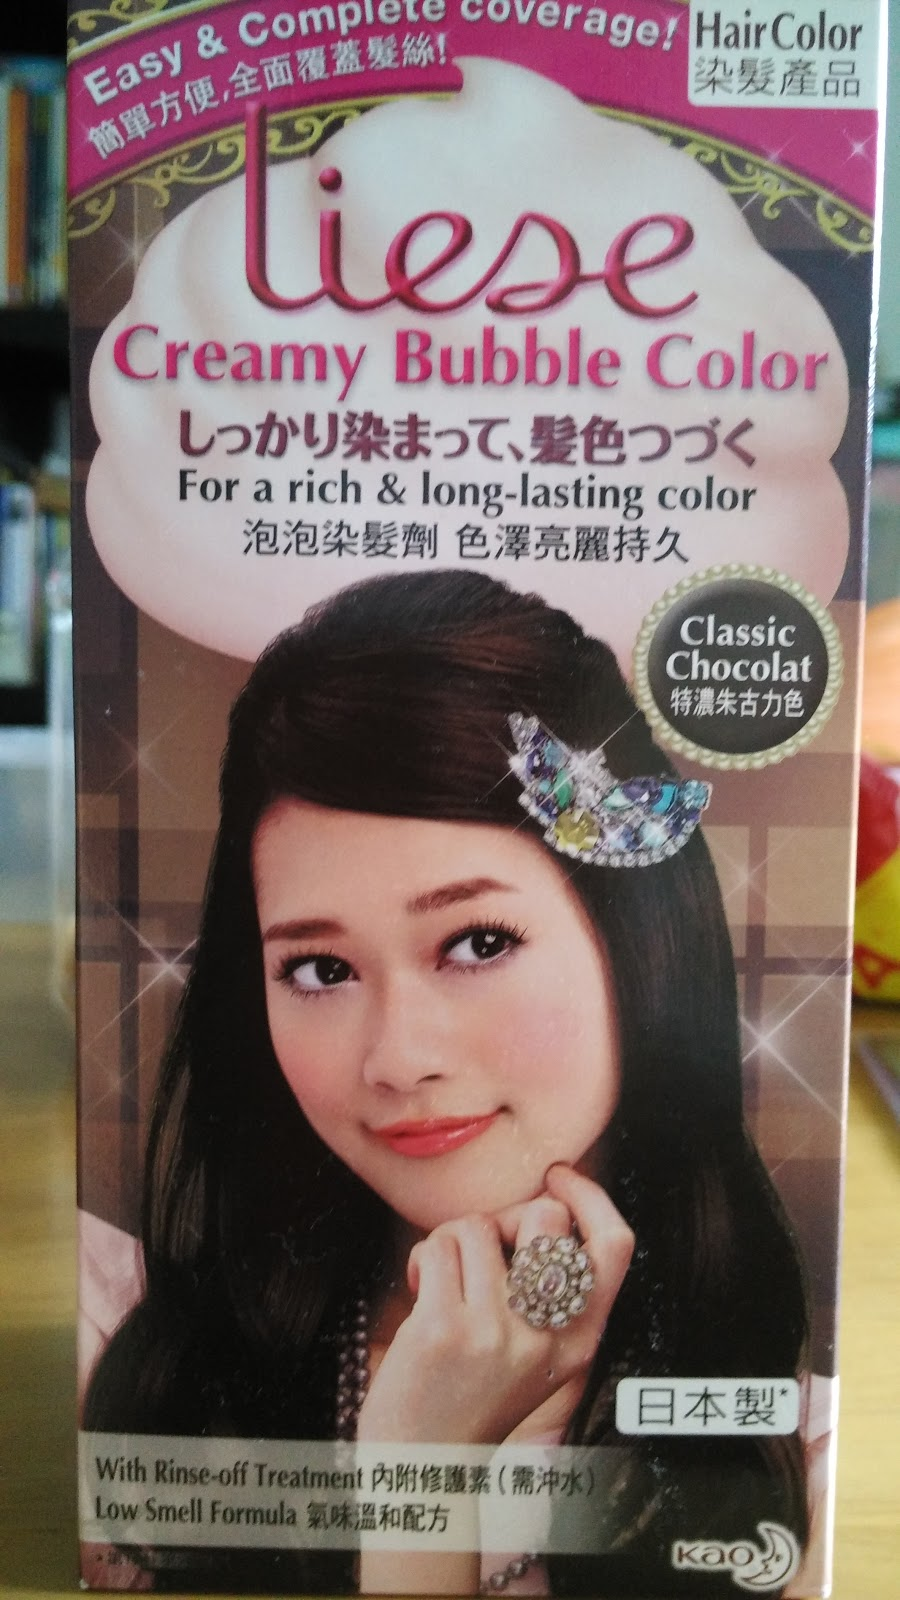 Ahjinssi Liese Creamy Bubble Hair Dye Classic Chocolate